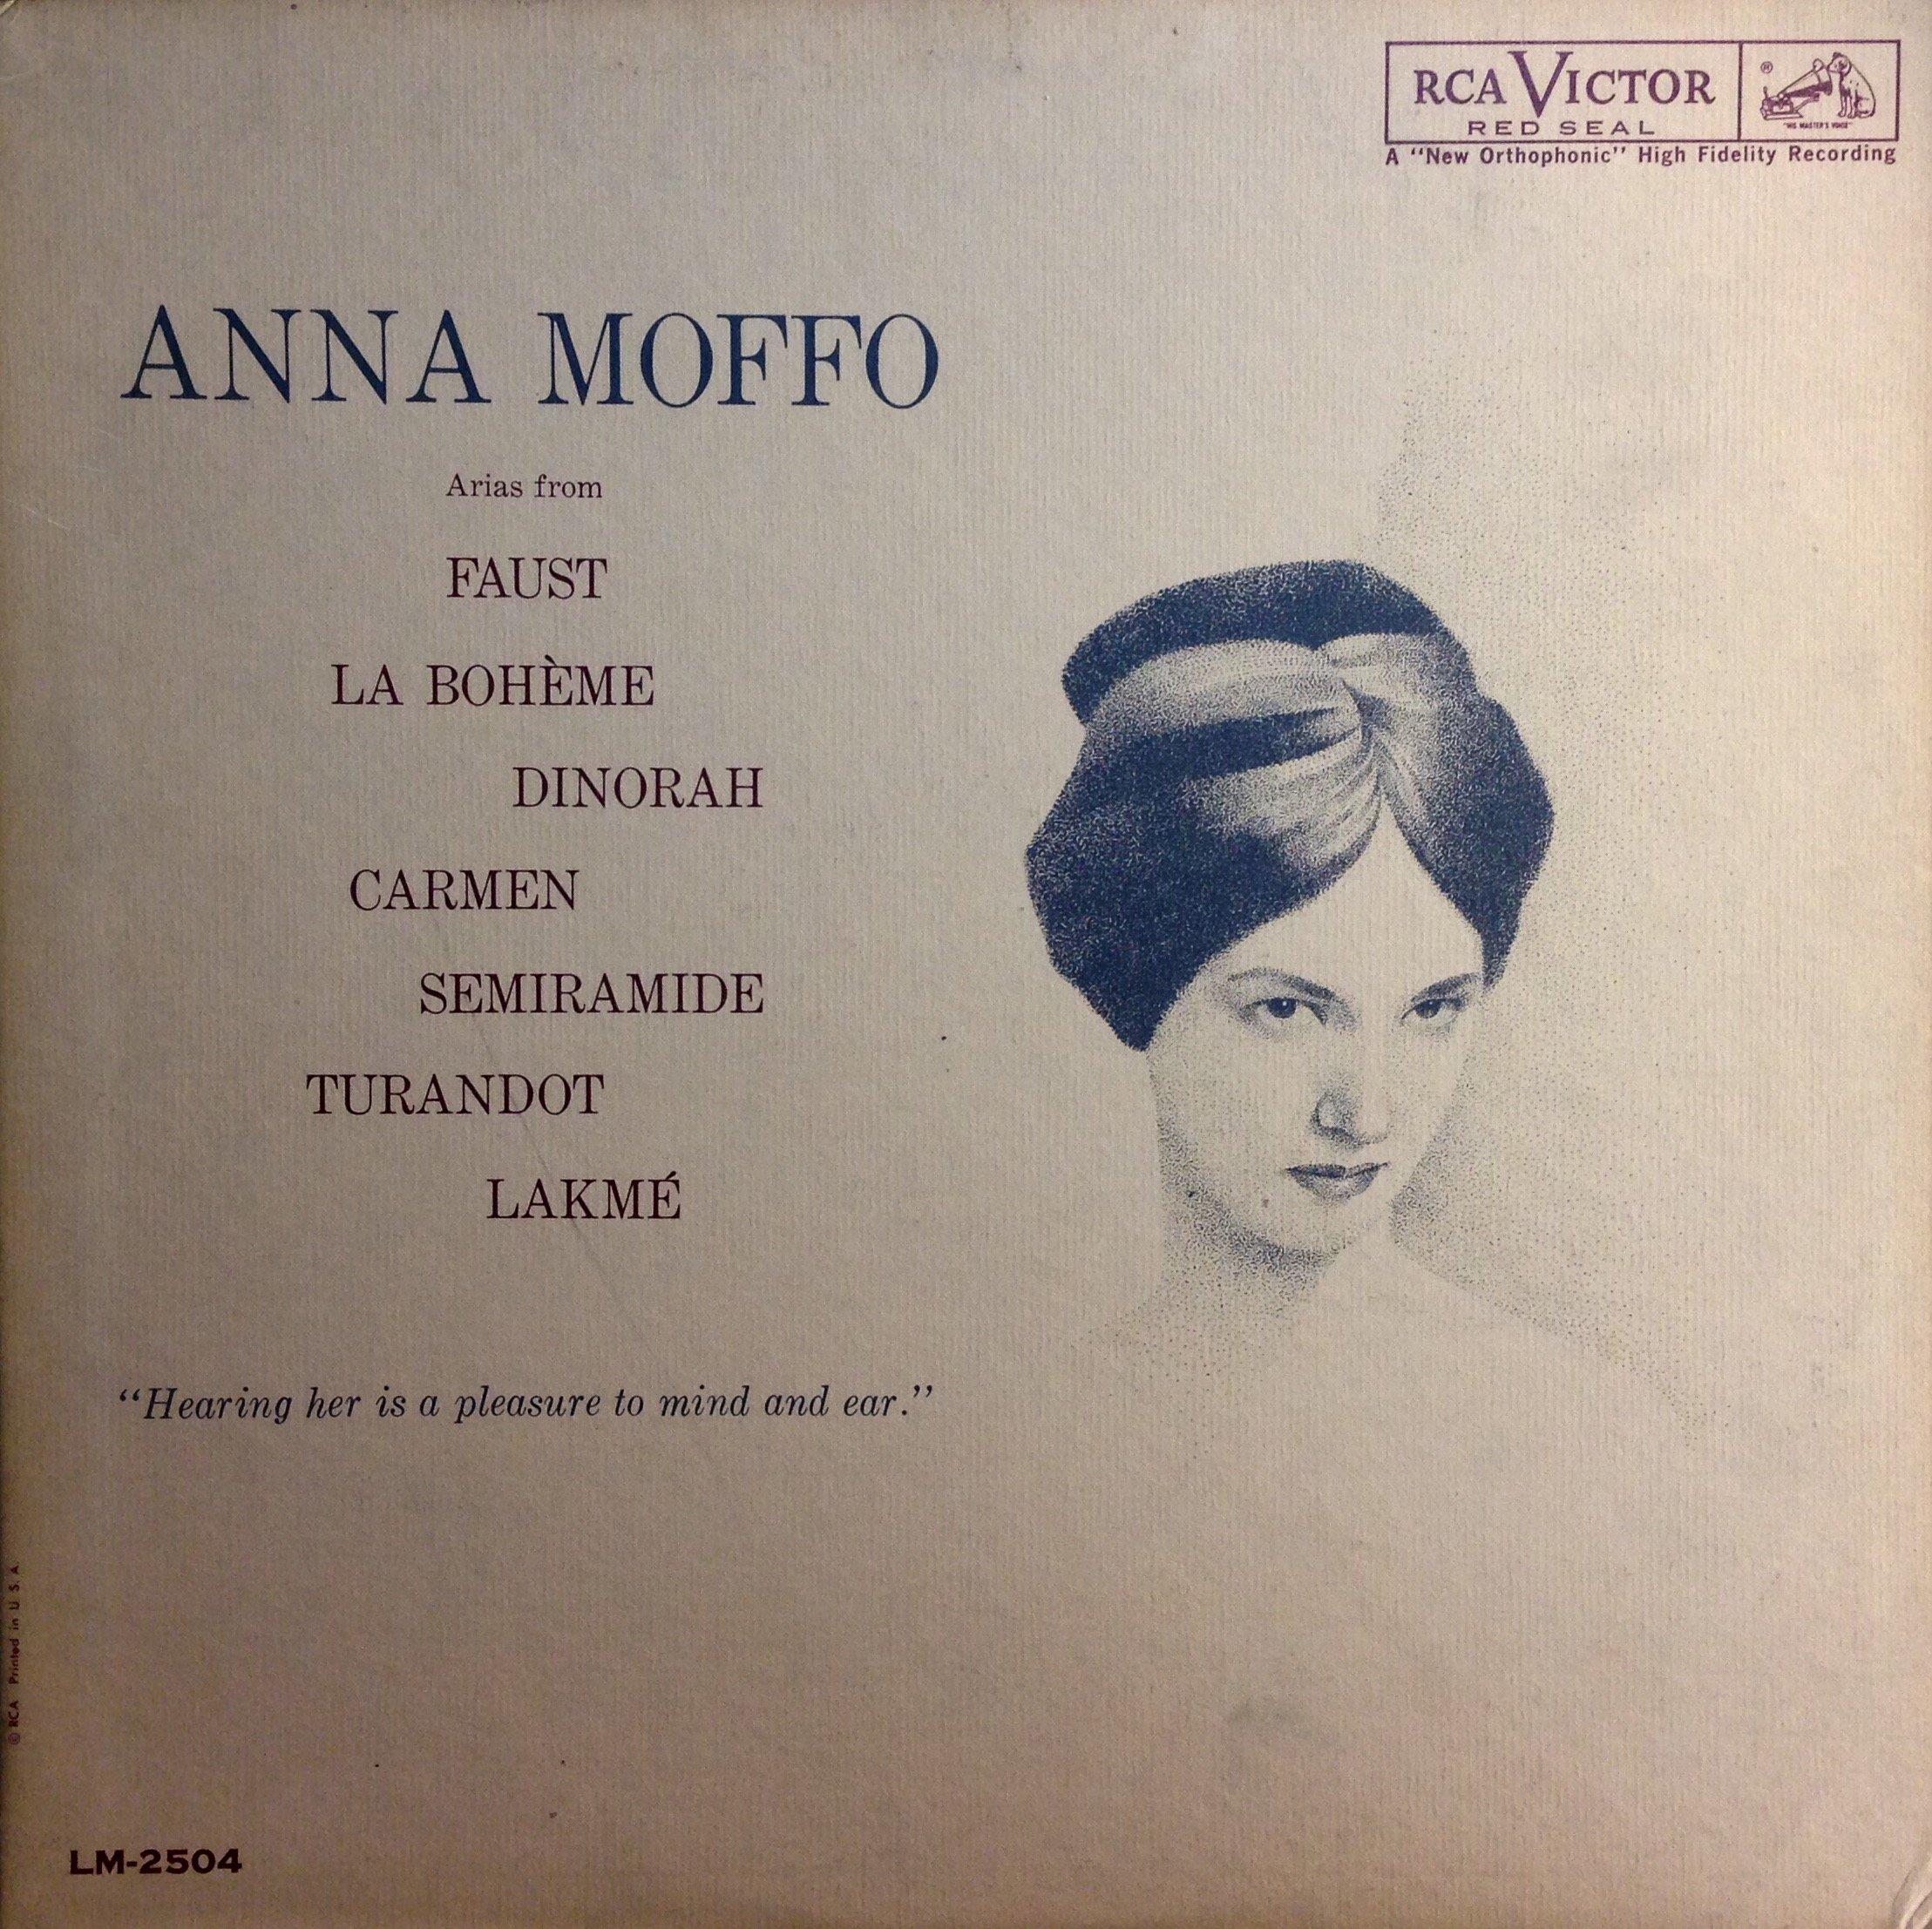 Anna Moffo: Arias From Faust, La Boheme, Dinorah, Carmen, Semiramide, Turnadot, Lakme (Living Stereo) by RCA Victor LSC-2504 Stereo